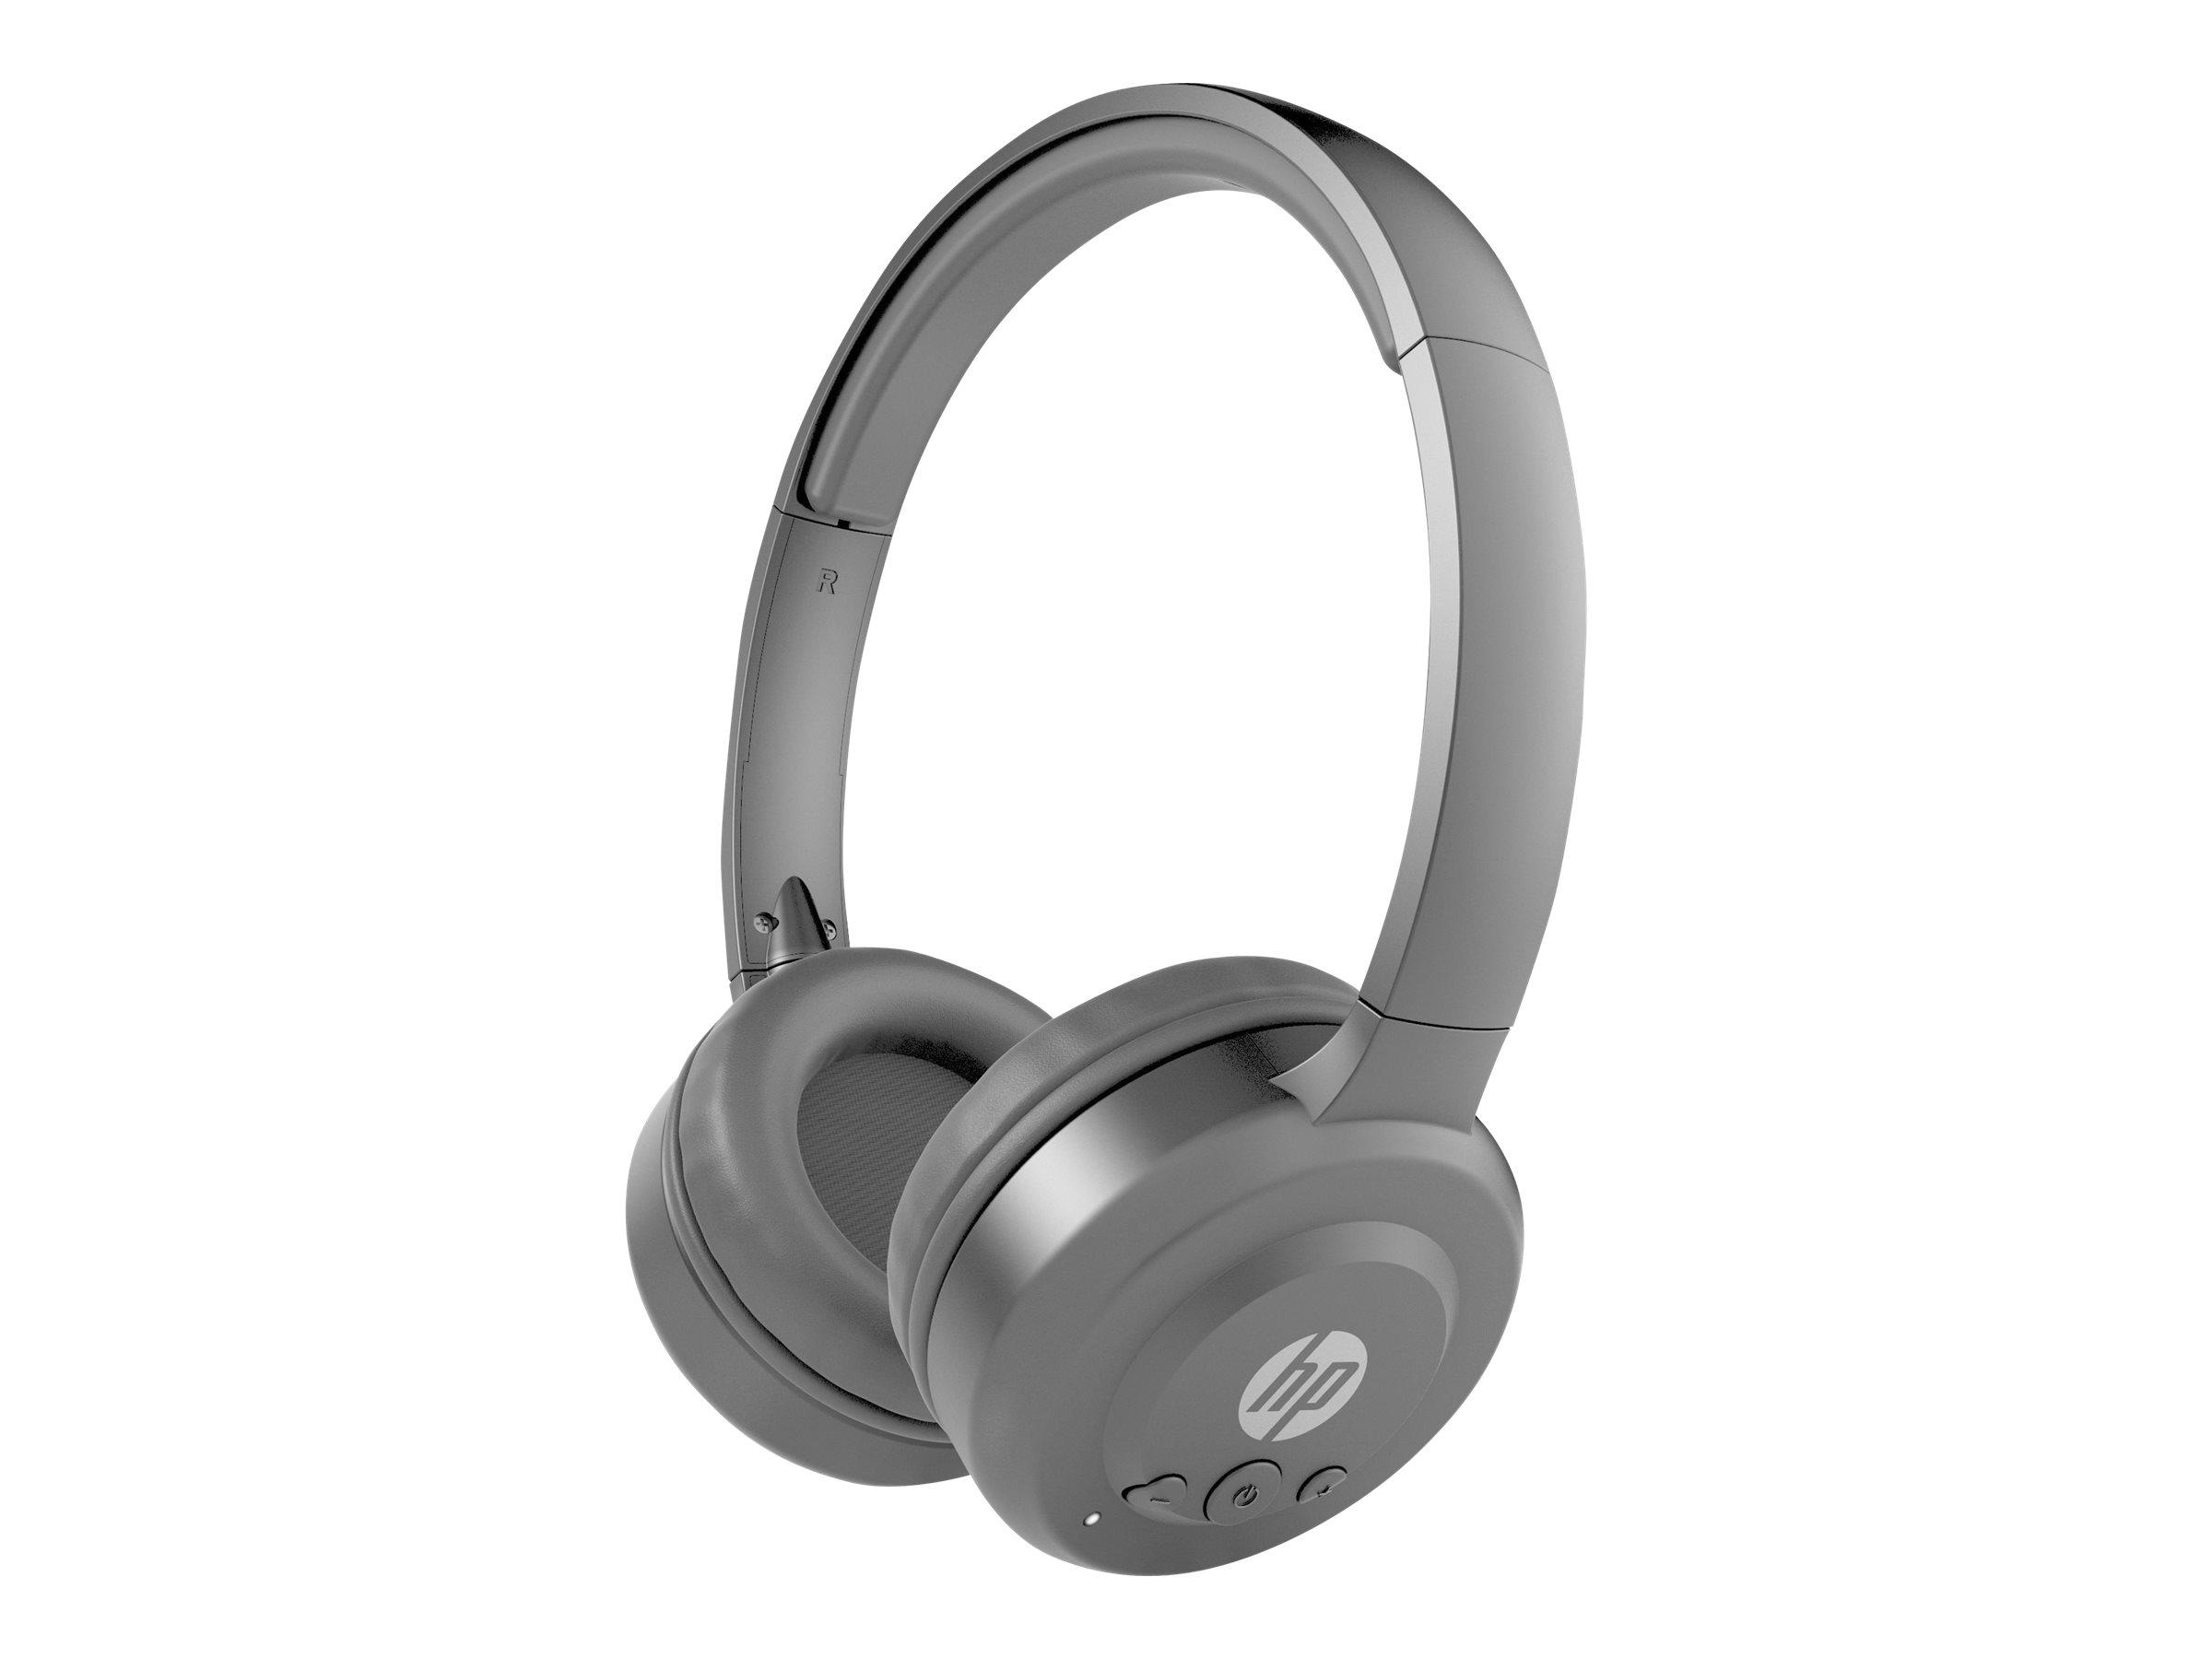 HP Pavilion Headset 600 - Headset - Full-Size - Bluetooth - kabellos - 3,5 mm Stecker